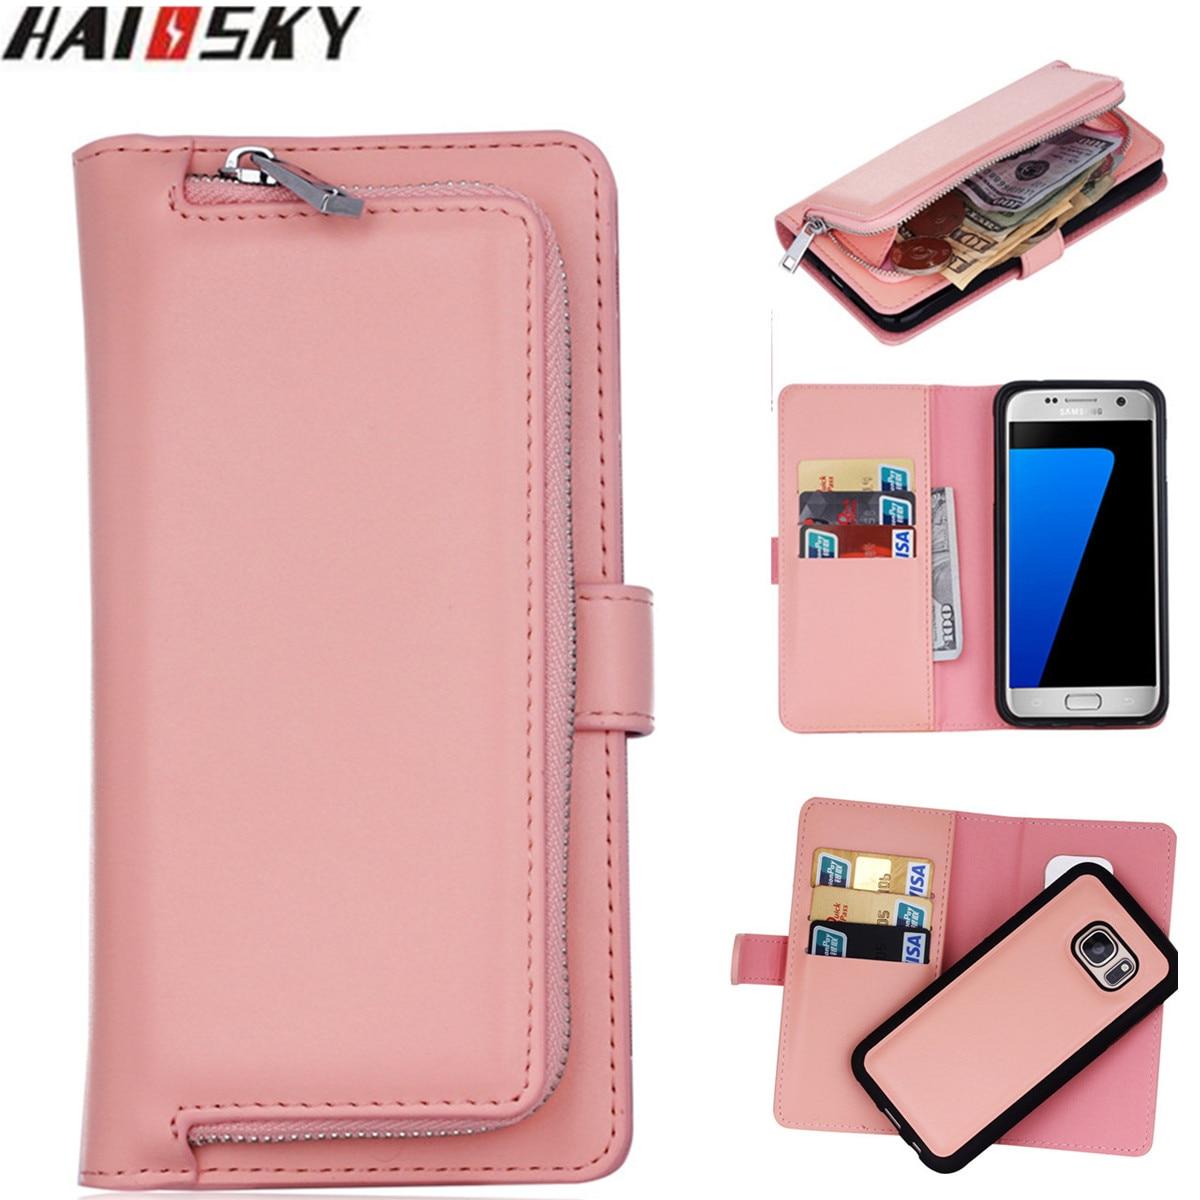 Pouzdro na zipper peněženku pro Samsung Galaxy S9 S8 Plus S7 S6 hrana Flip Kožené magnetické pouzdro pro Samsung S6 S5 Note 9 8 Cover